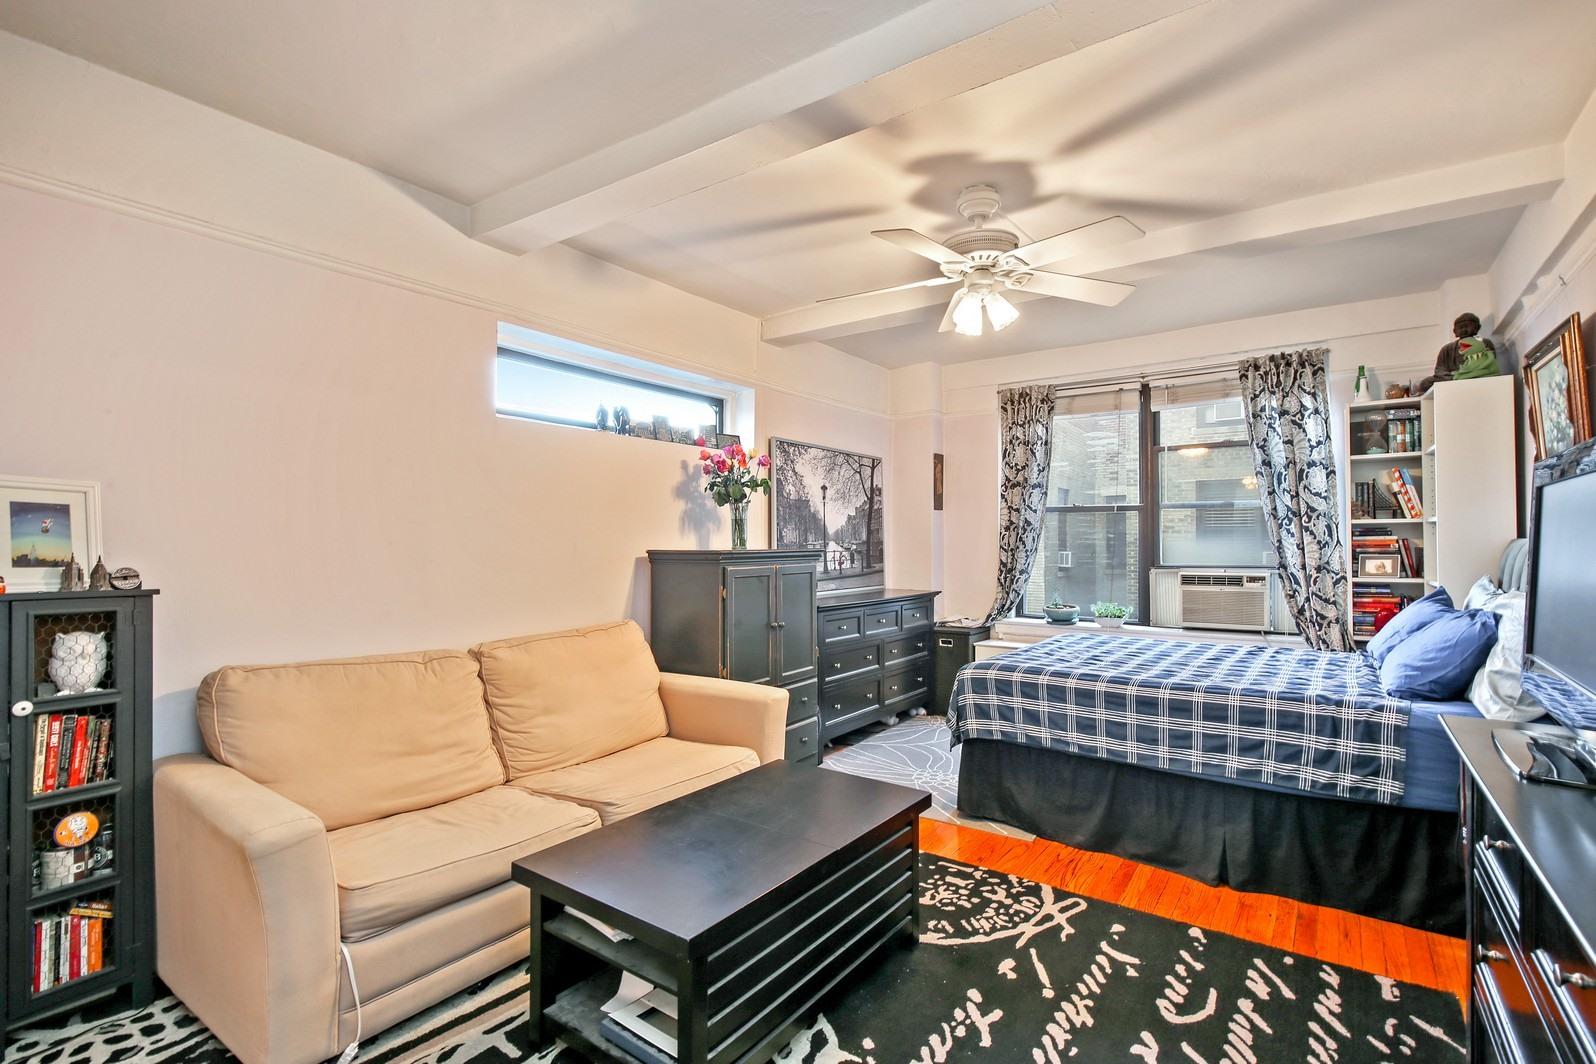 2122105971 235w102ndst apt15u 1 livingroom custom resized 433653444 1600x1064zip 1600x1064